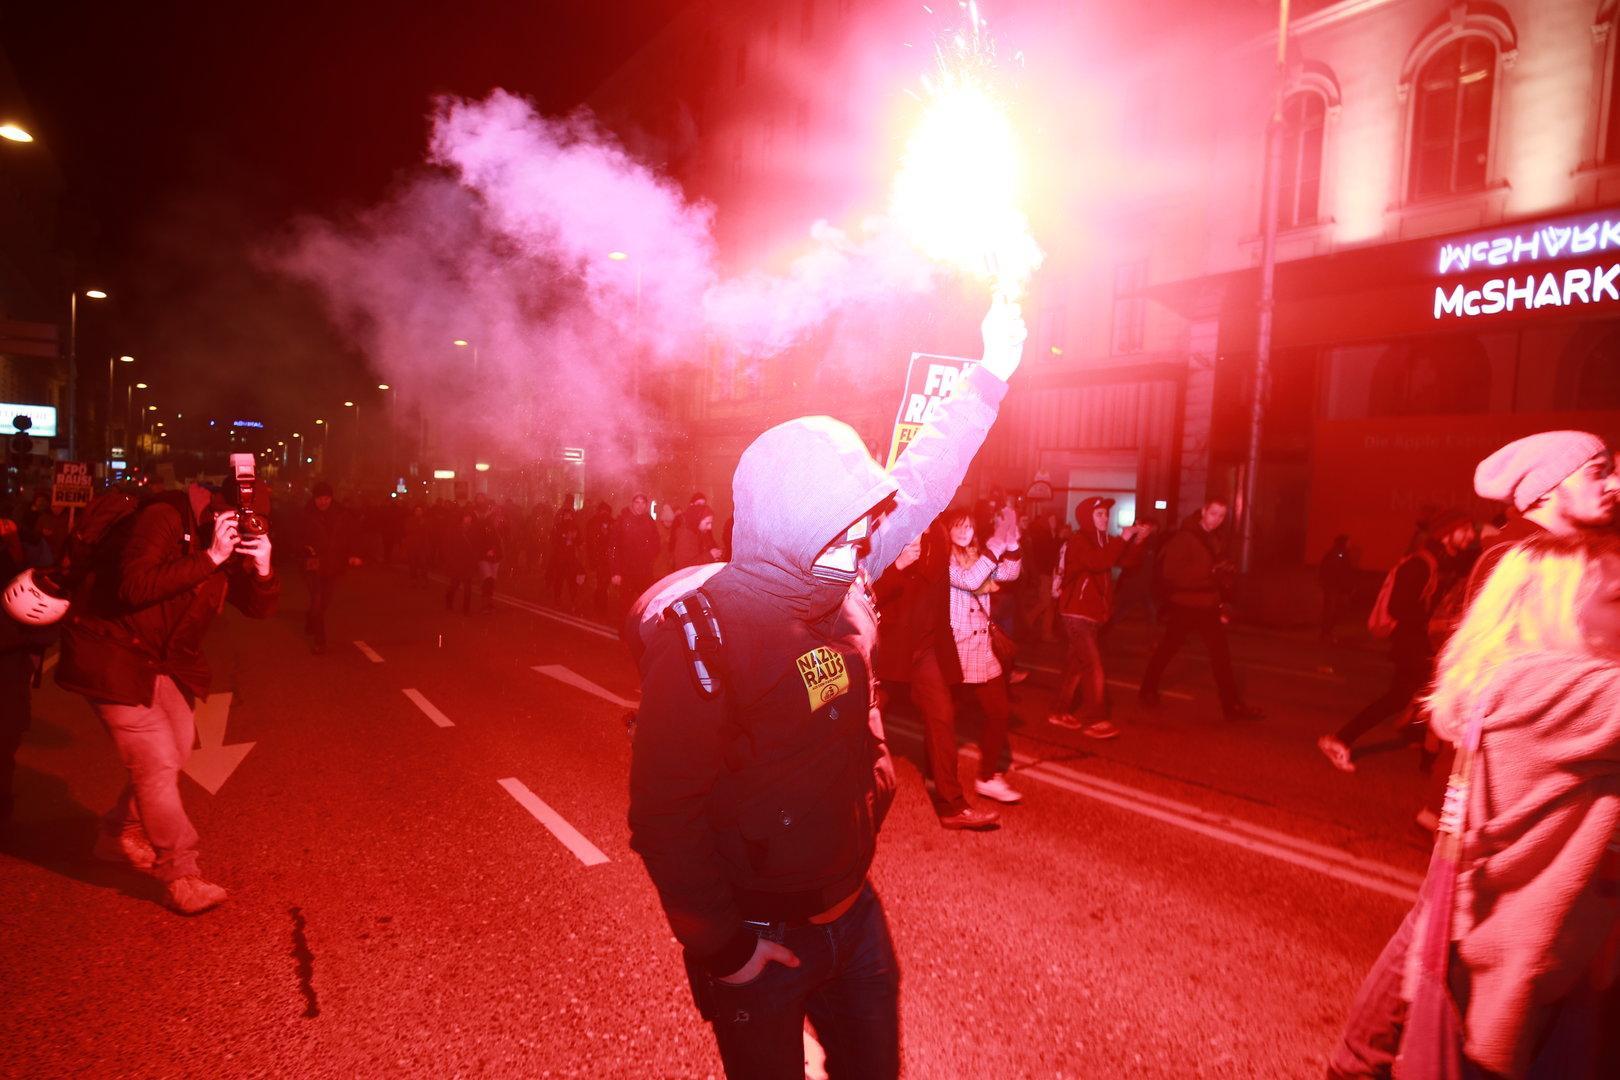 Antifa-Proteste: Ist die radikale Linke müde geworden?